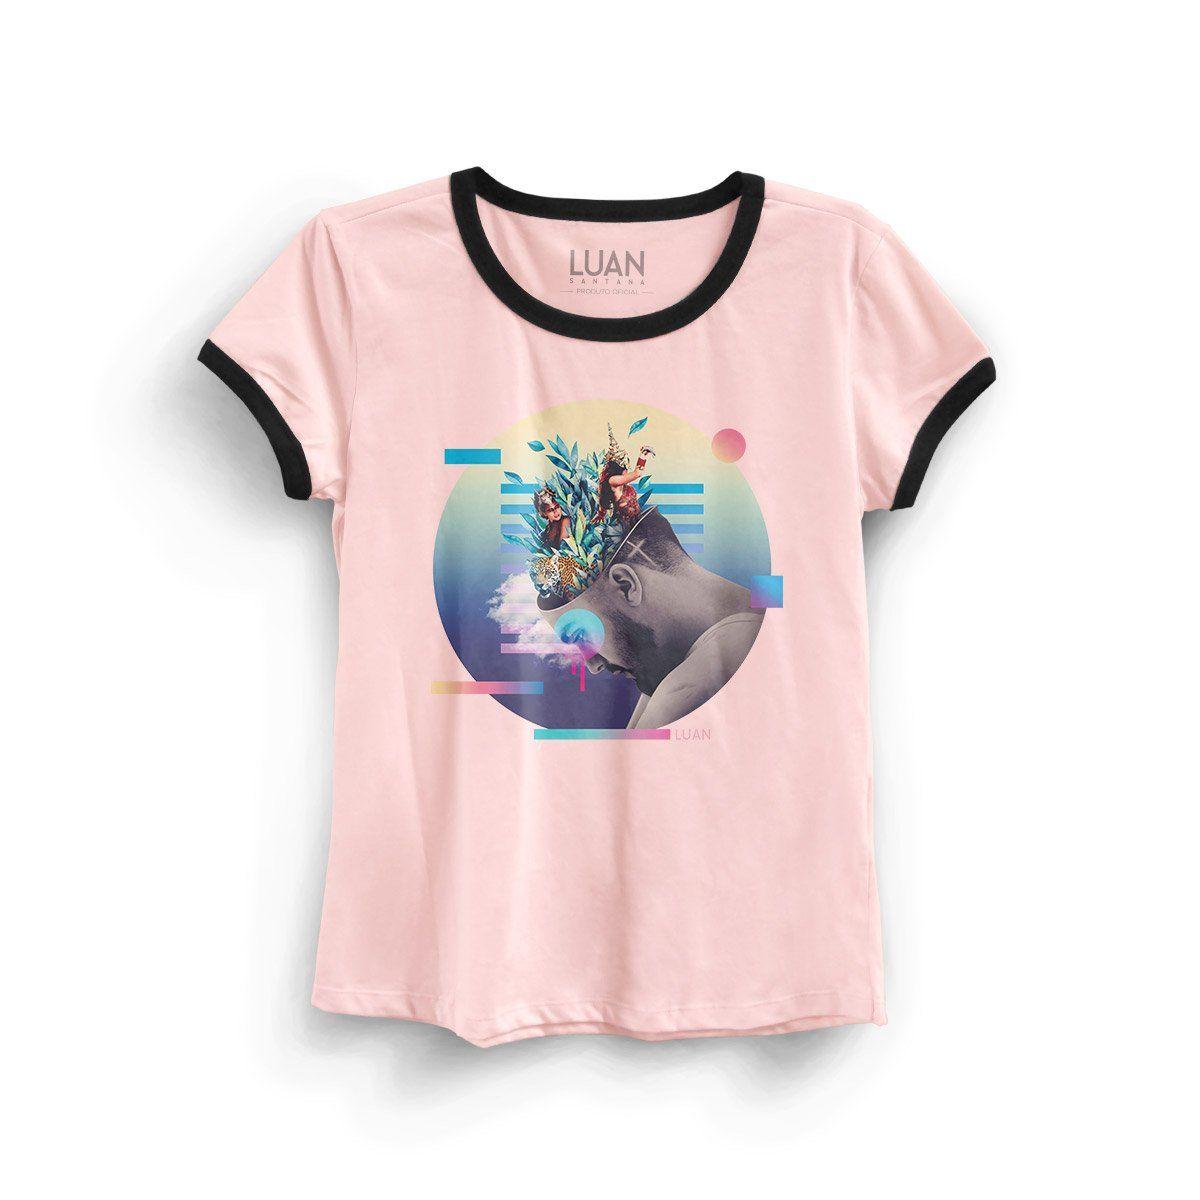 Camiseta Ringer Feminina Luan Santana Check-In